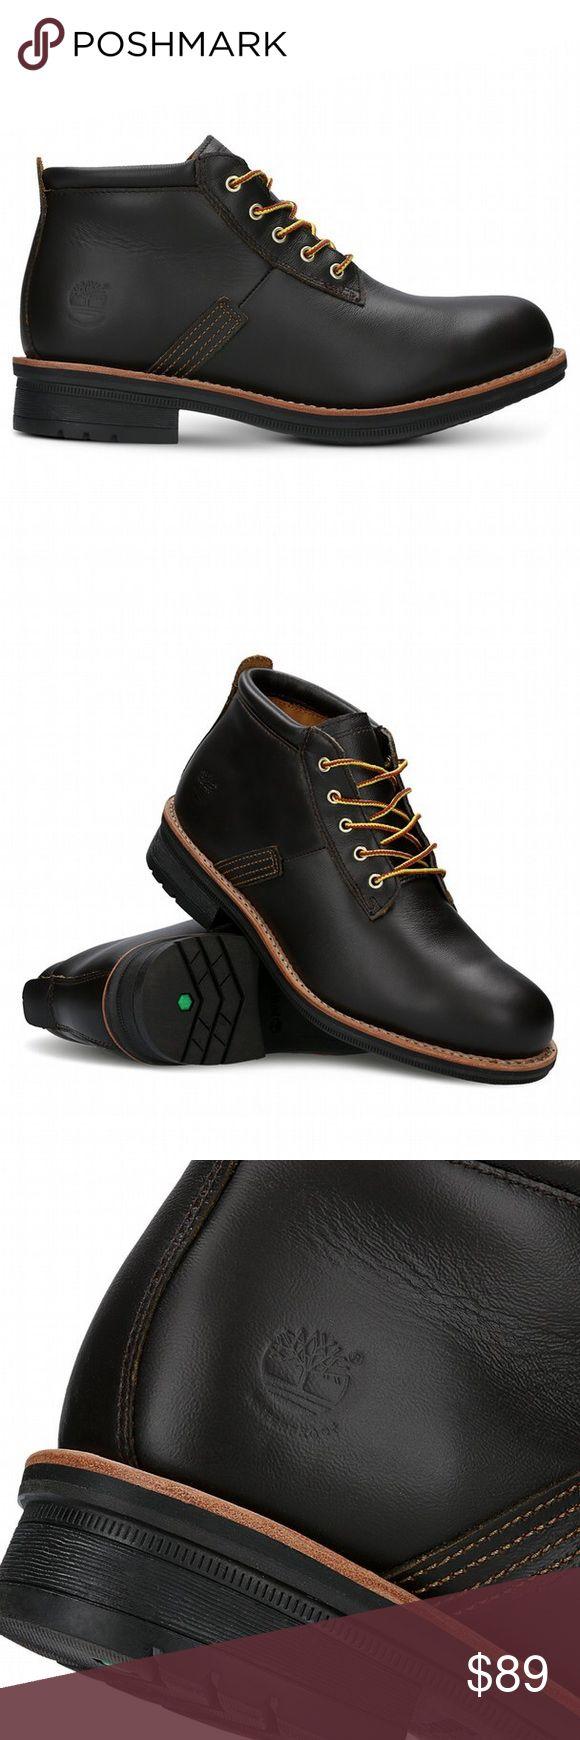 Timberland Mens Westbank Chukka WP Boot A18KN Timberland Mens Westbank Chukka Waterproof Boot A18KN Dark brown Timberland Shoes Chukka Boots